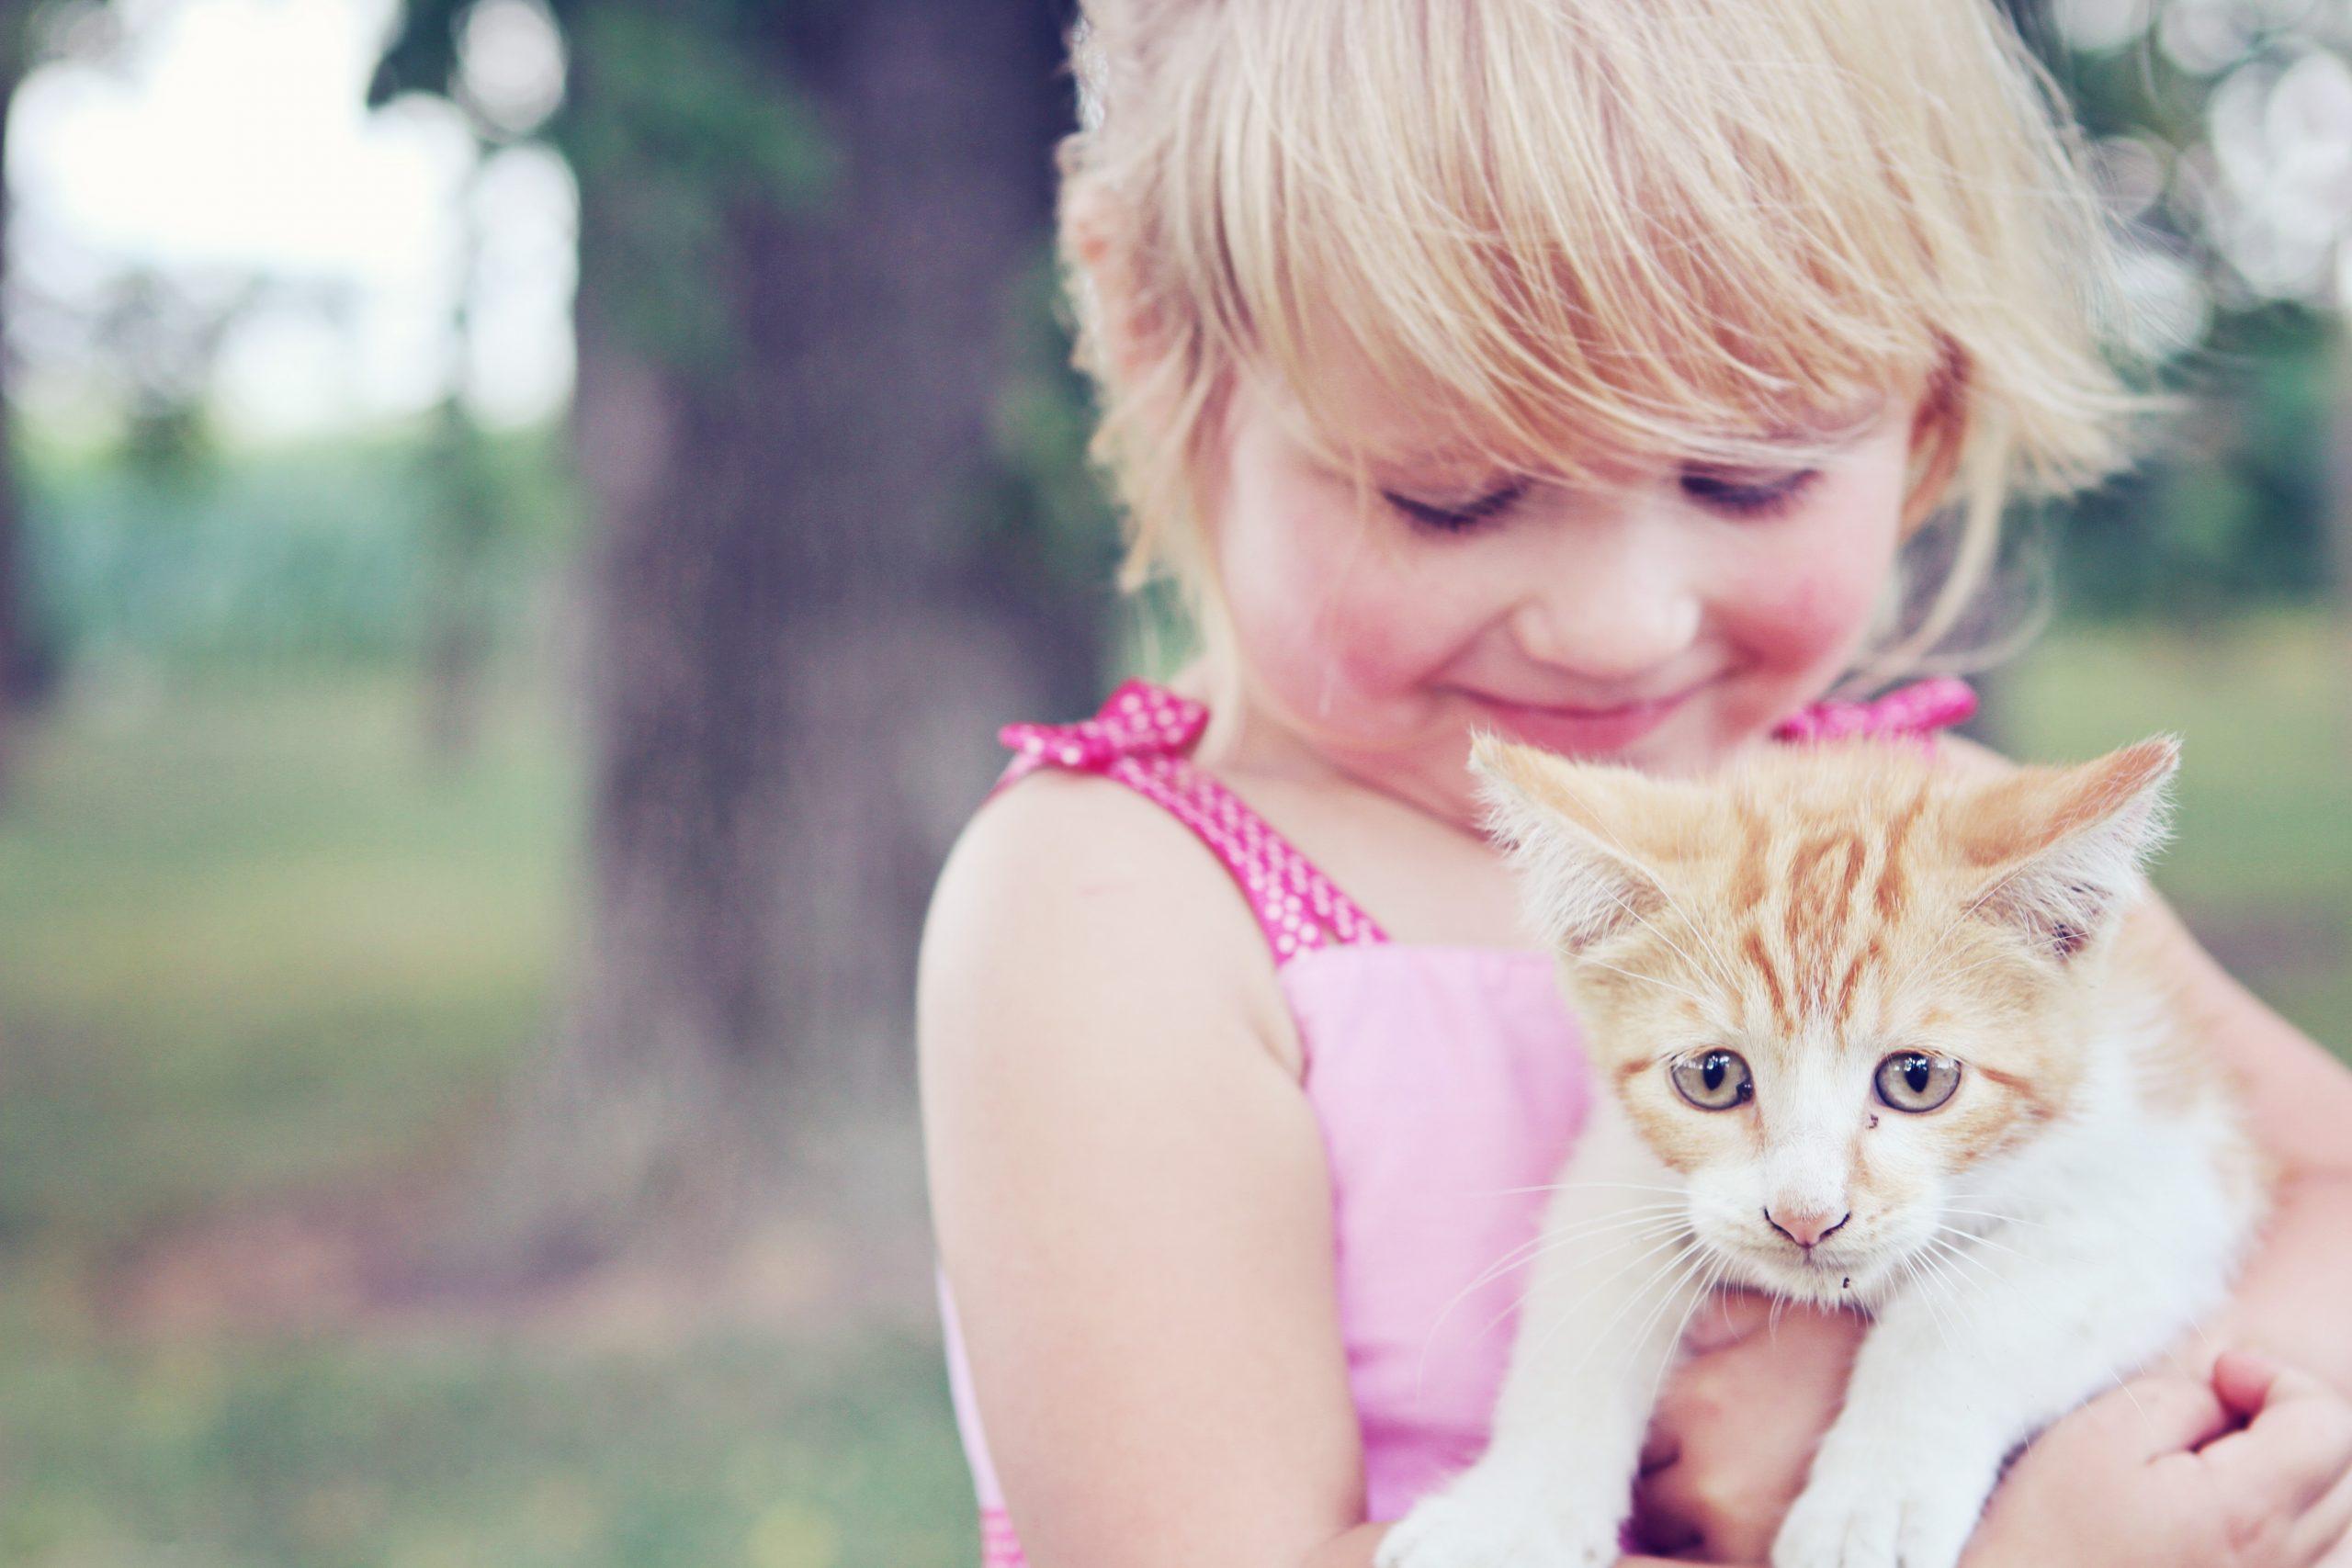 nature-outdoor-girl-kid-animal-cute-906013-pxhere.com